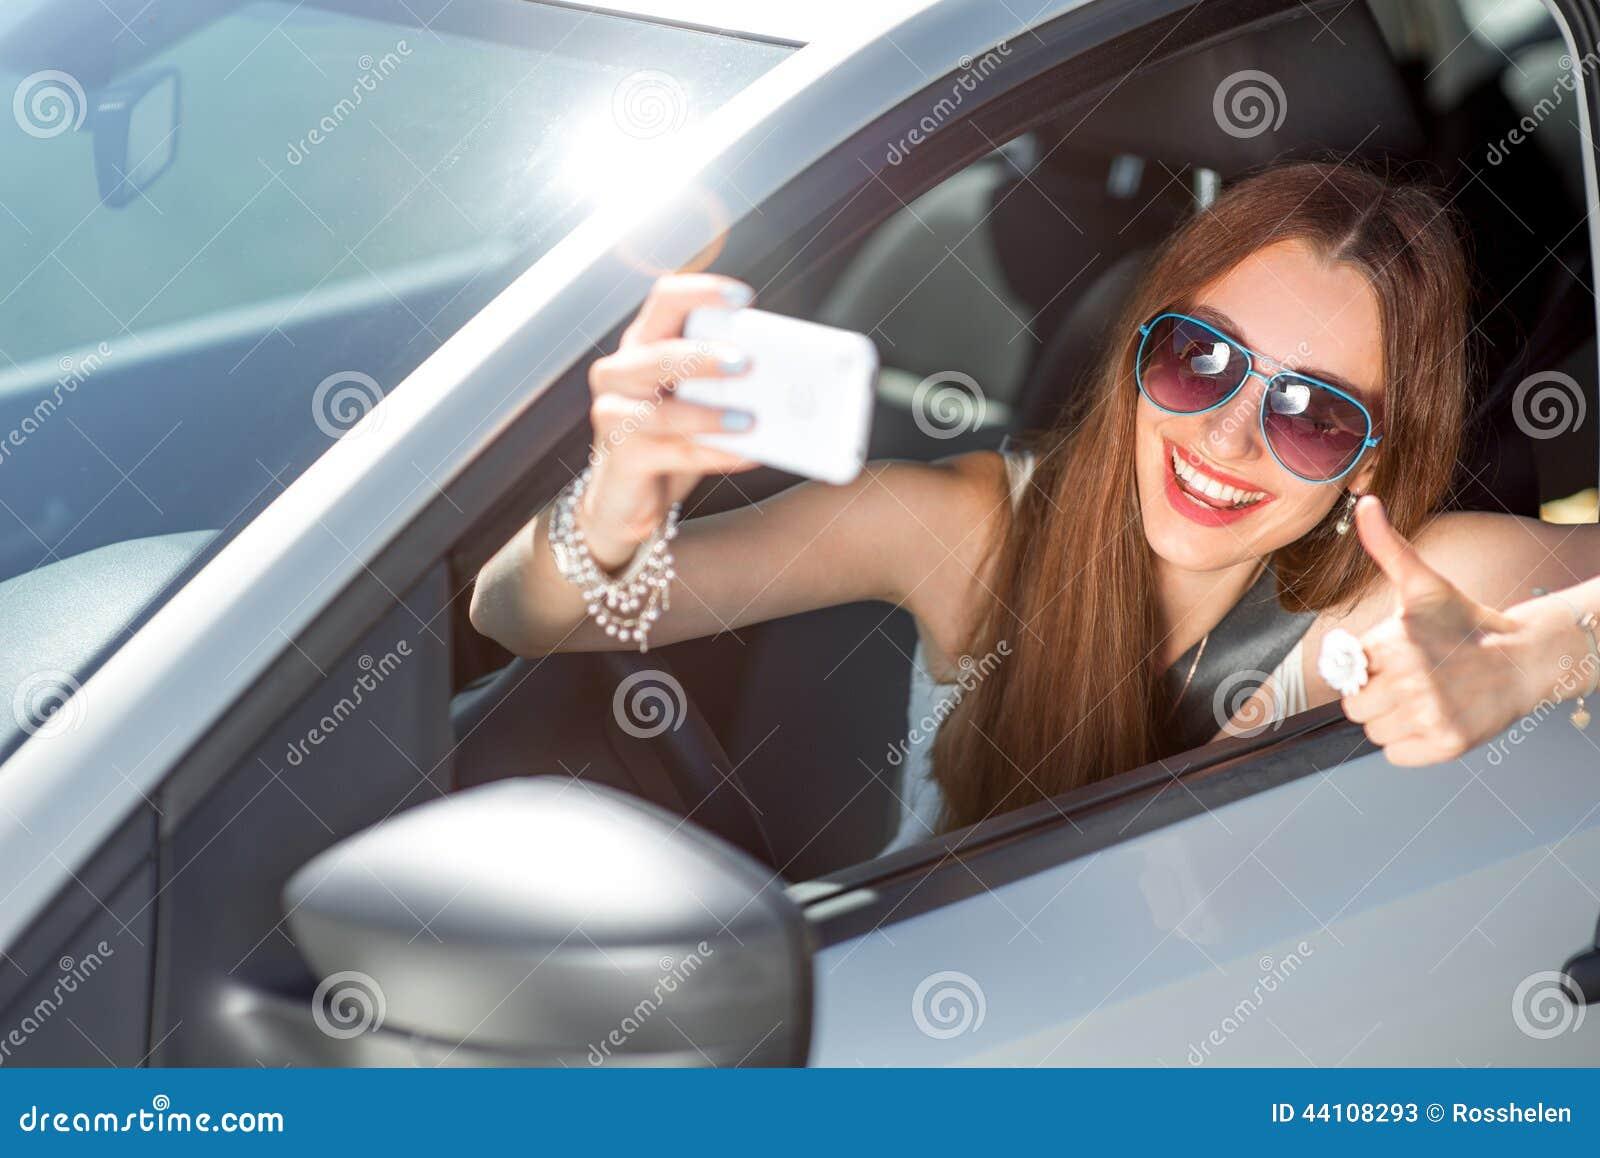 on taking cars - photo #7